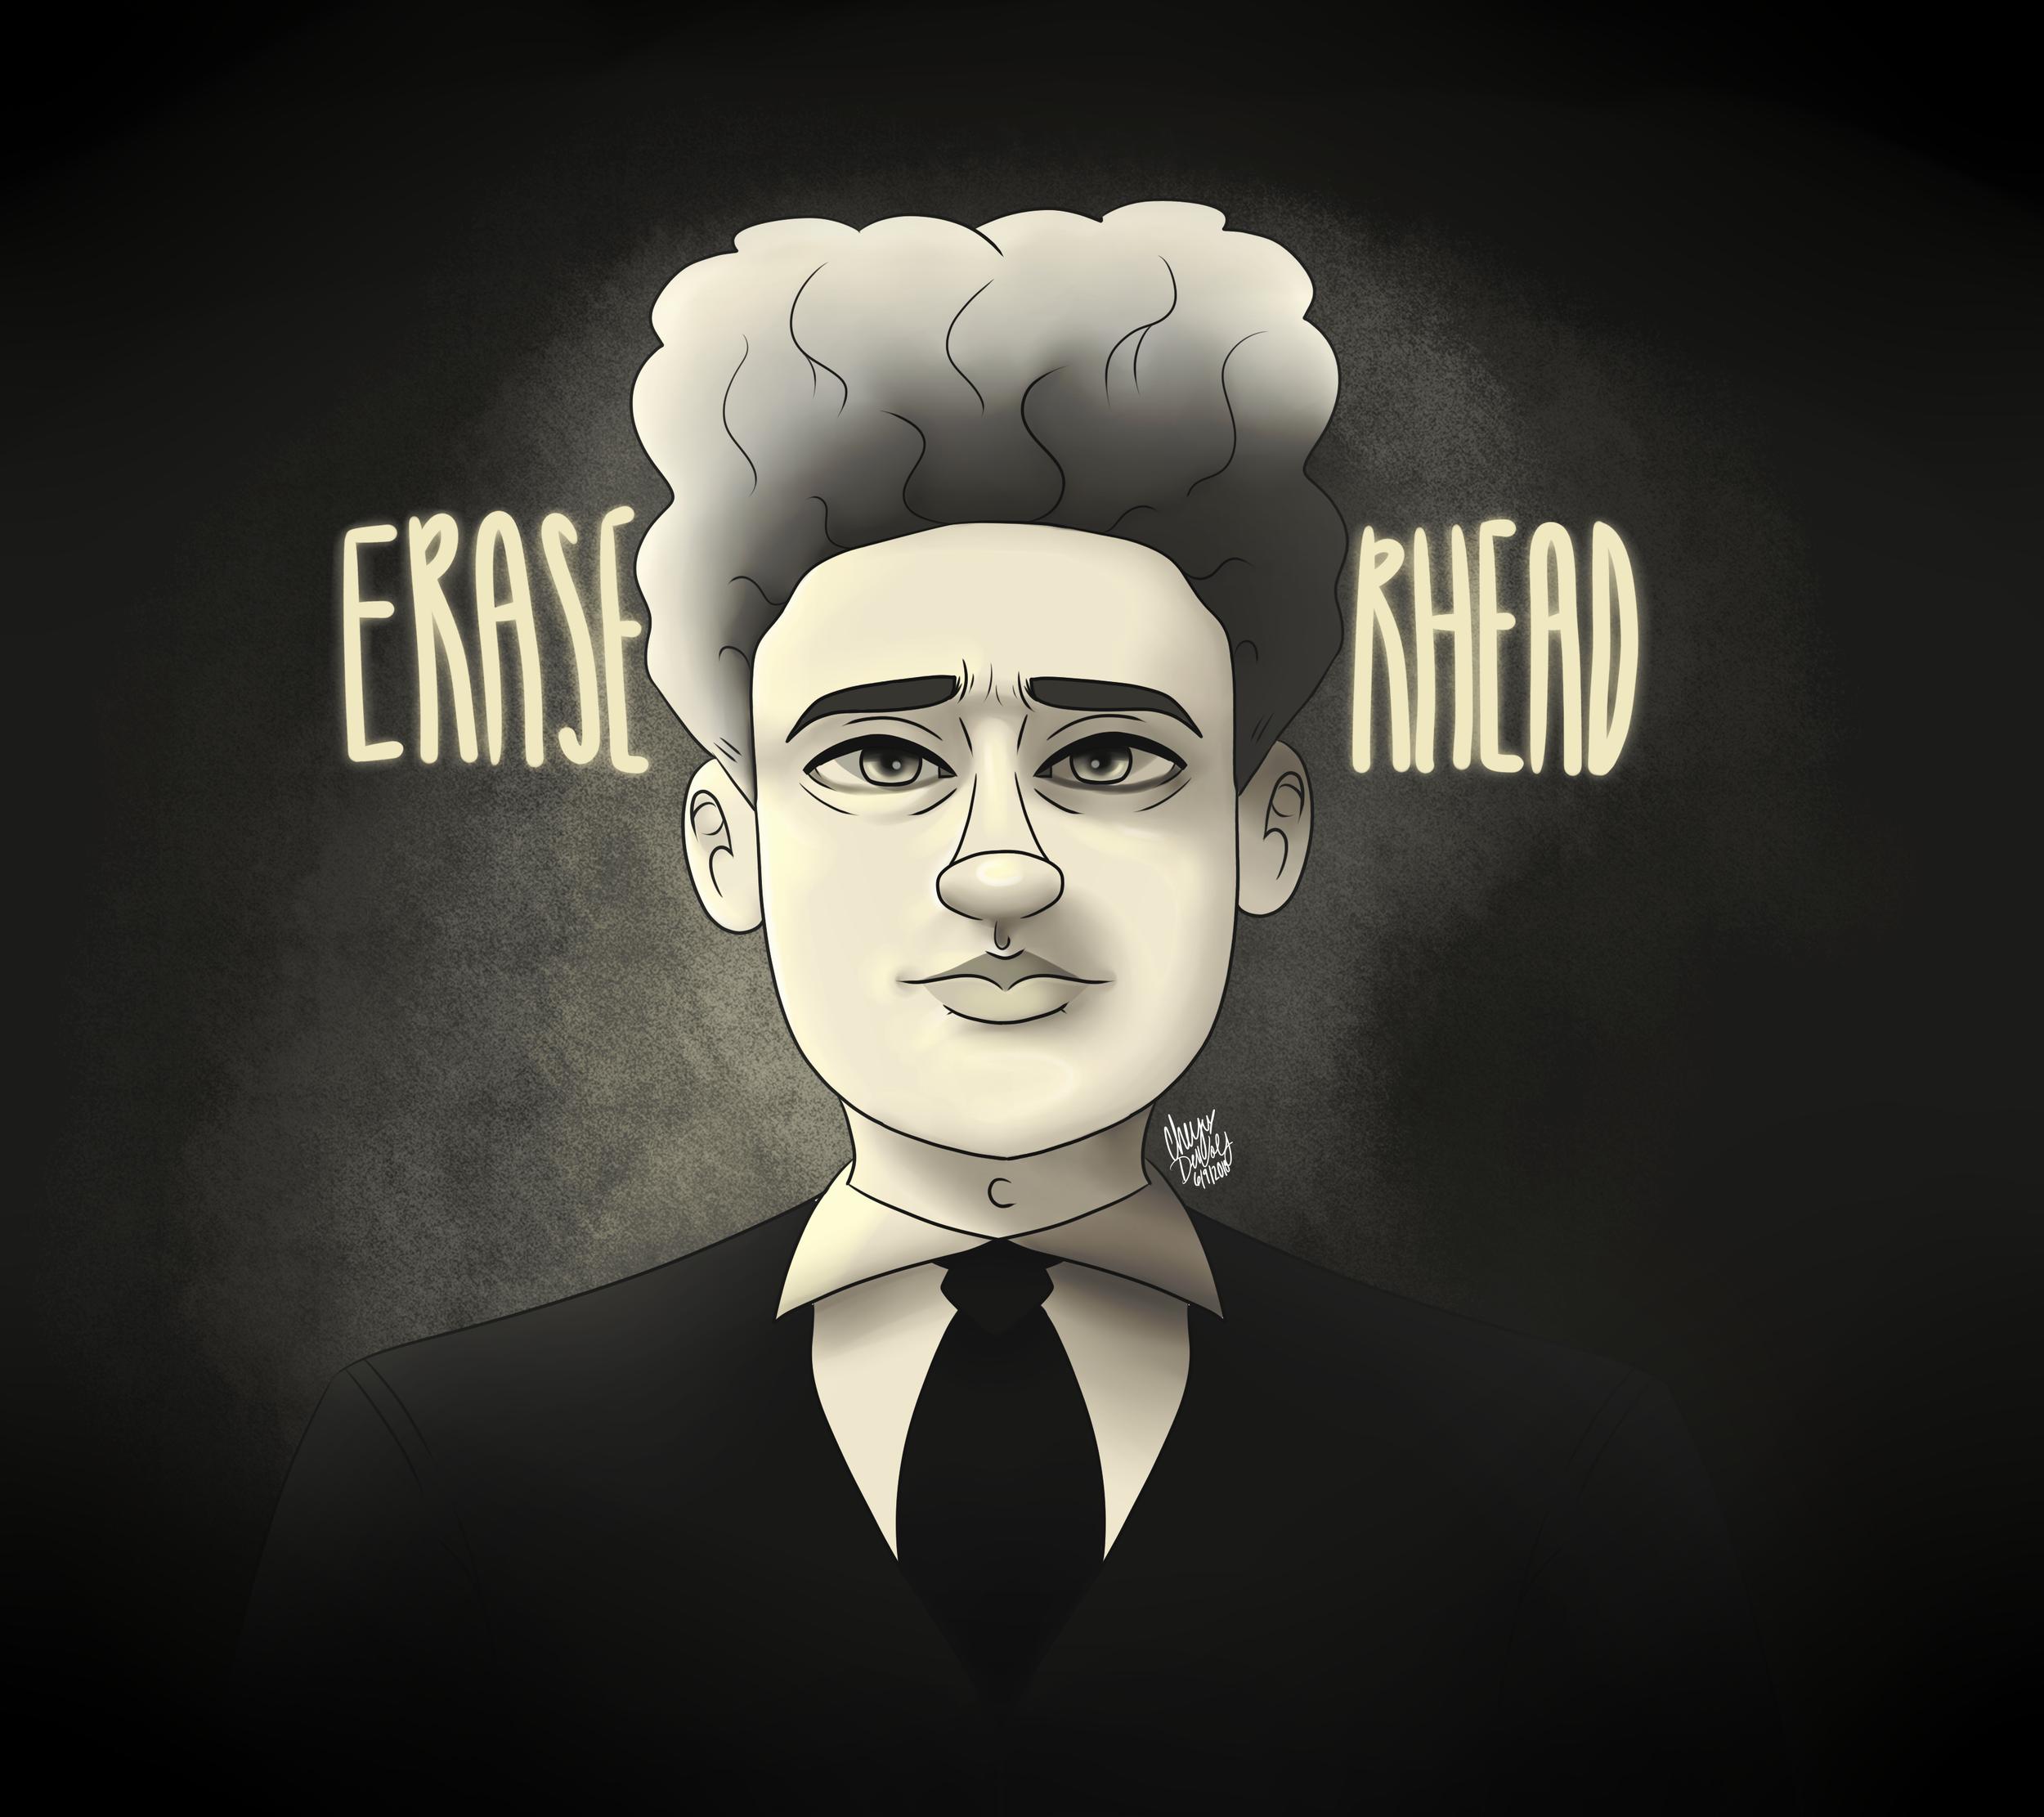 eraserhead.png